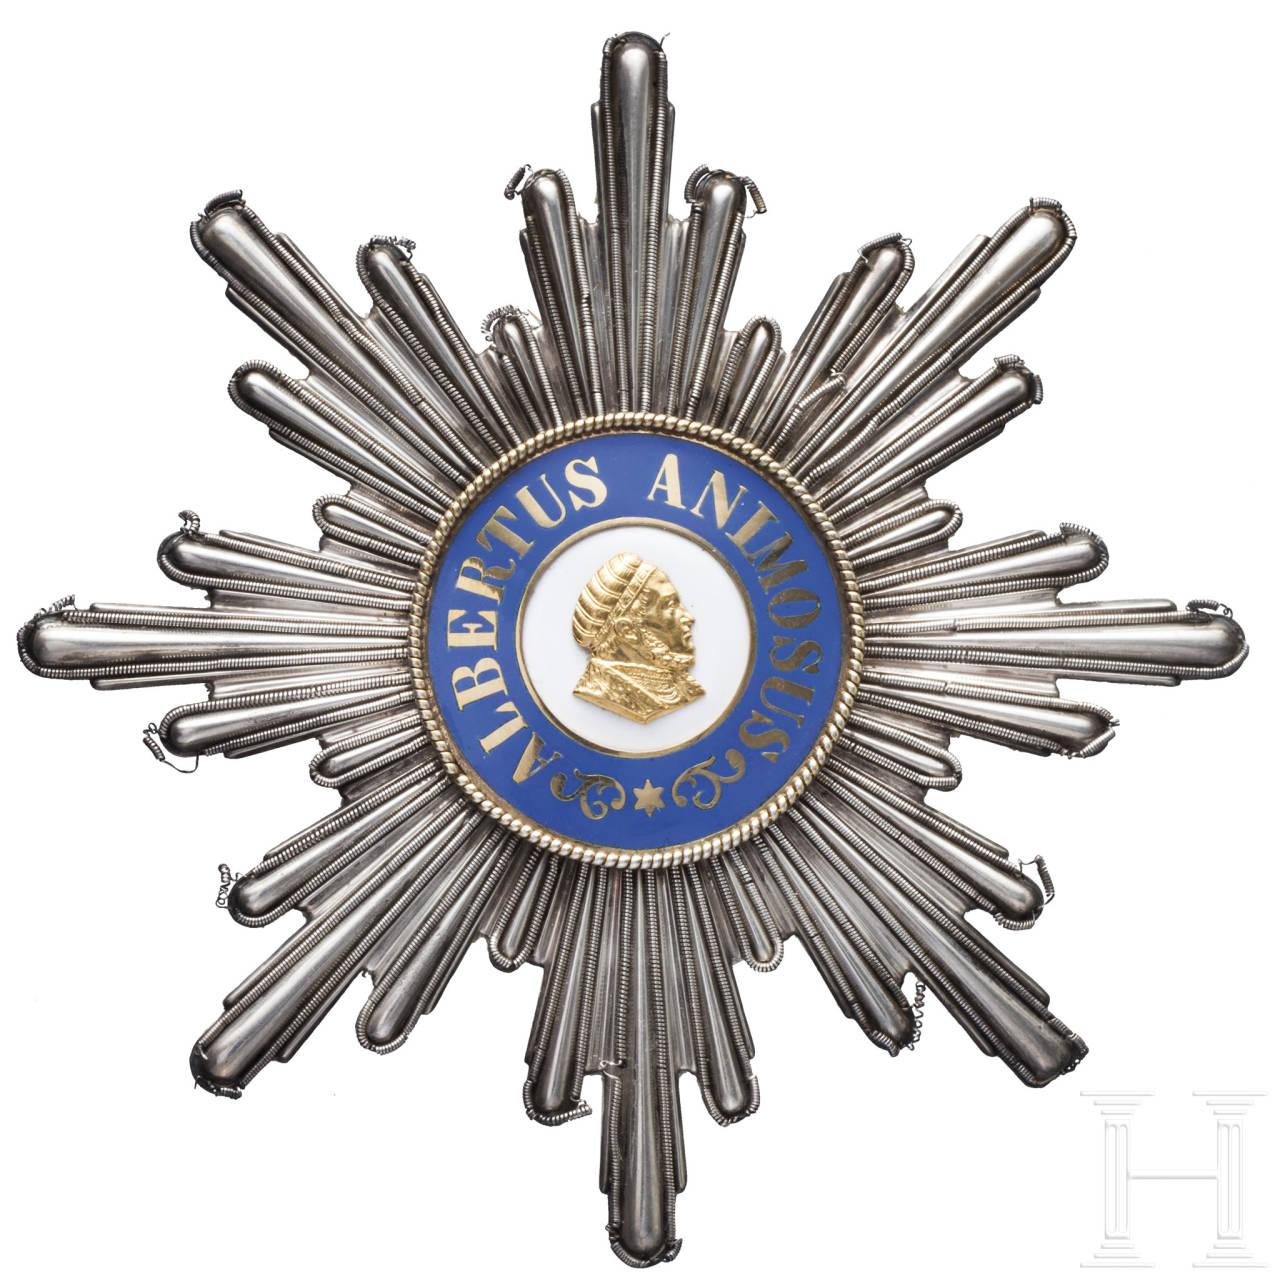 Albrechtsorden - Breast Star of the Grand Cross 1. model